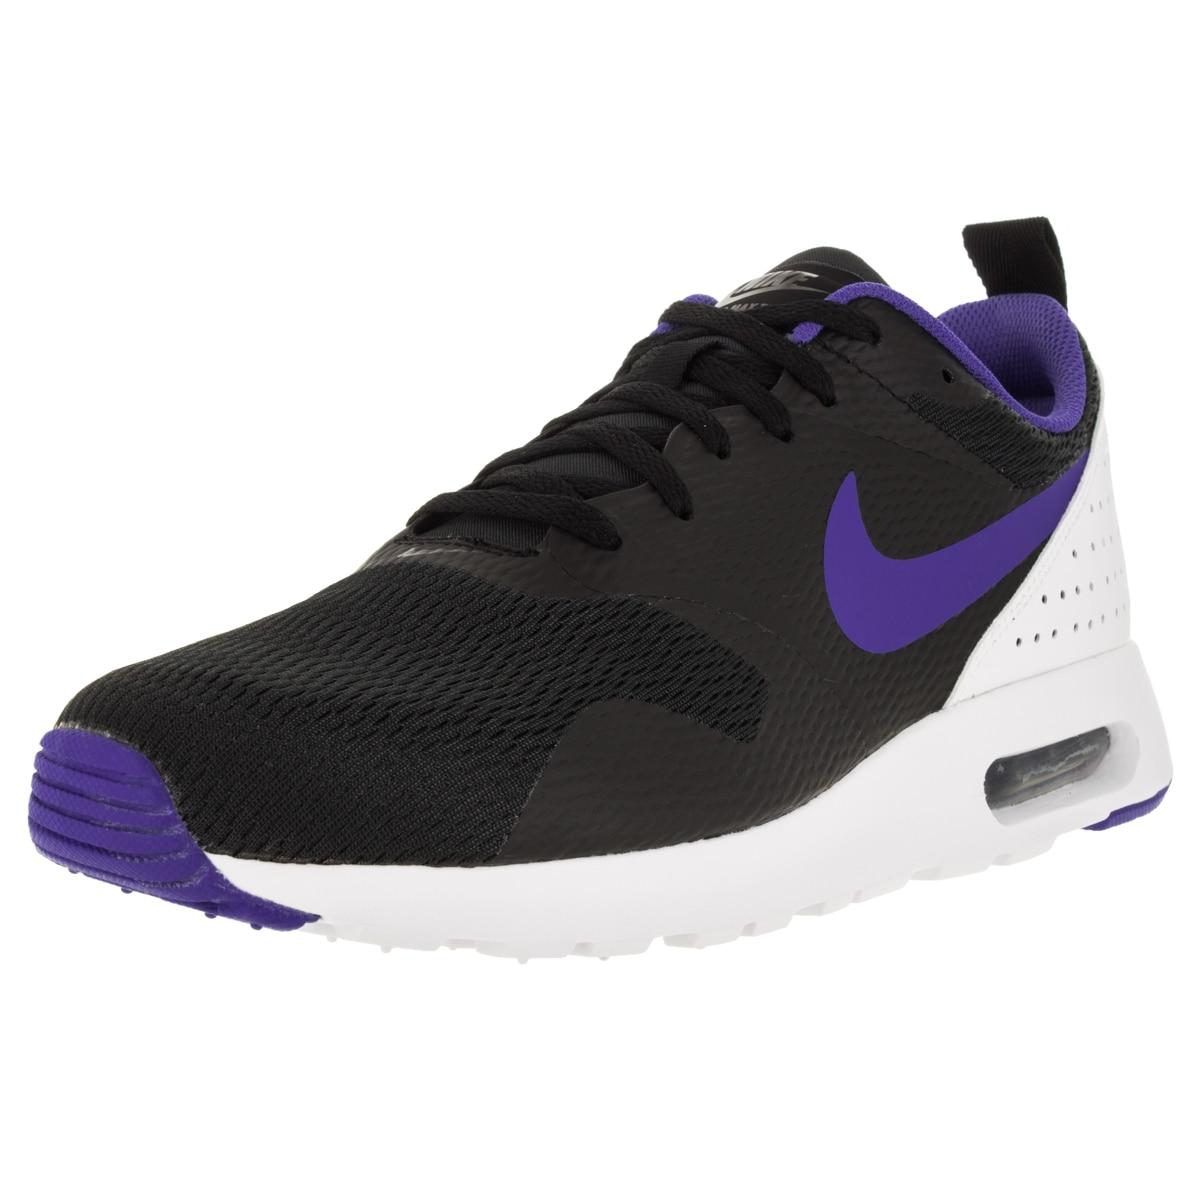 info for 86229 11099 Nike Mens Air Max Tavas BlackPersian VioletWhite Running Shoe